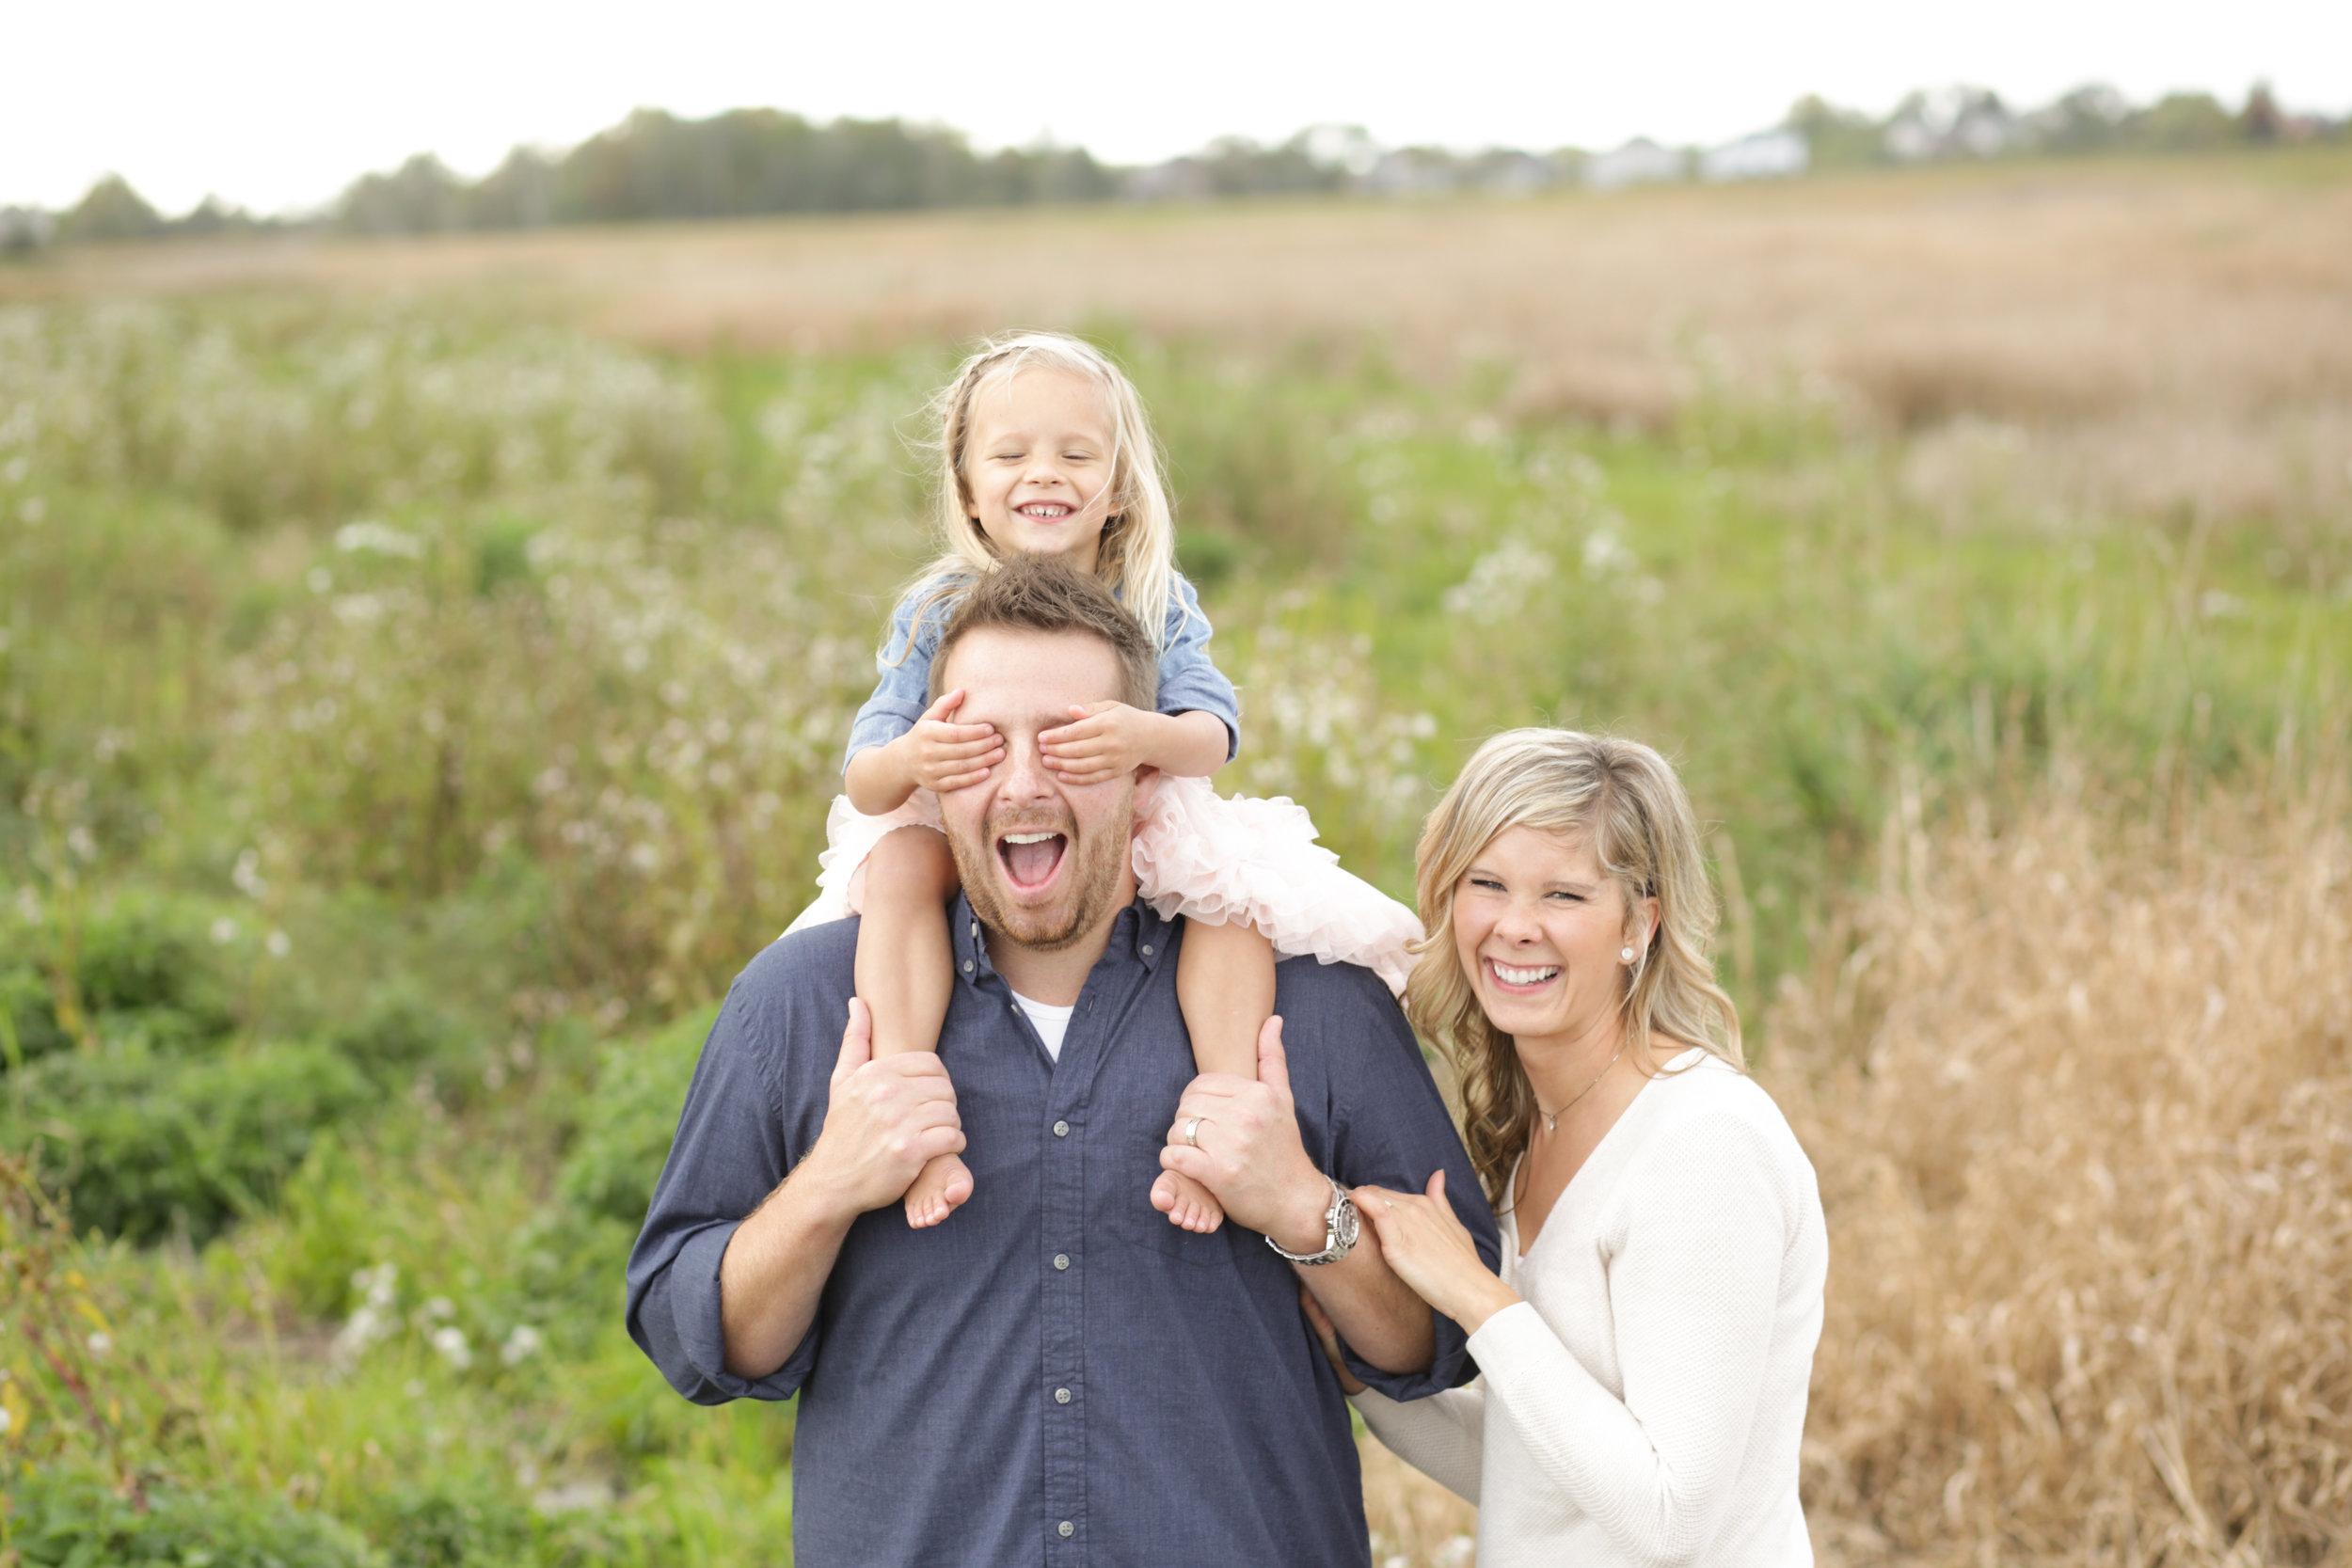 Blaine Family Photographer (9 of 26).jpg